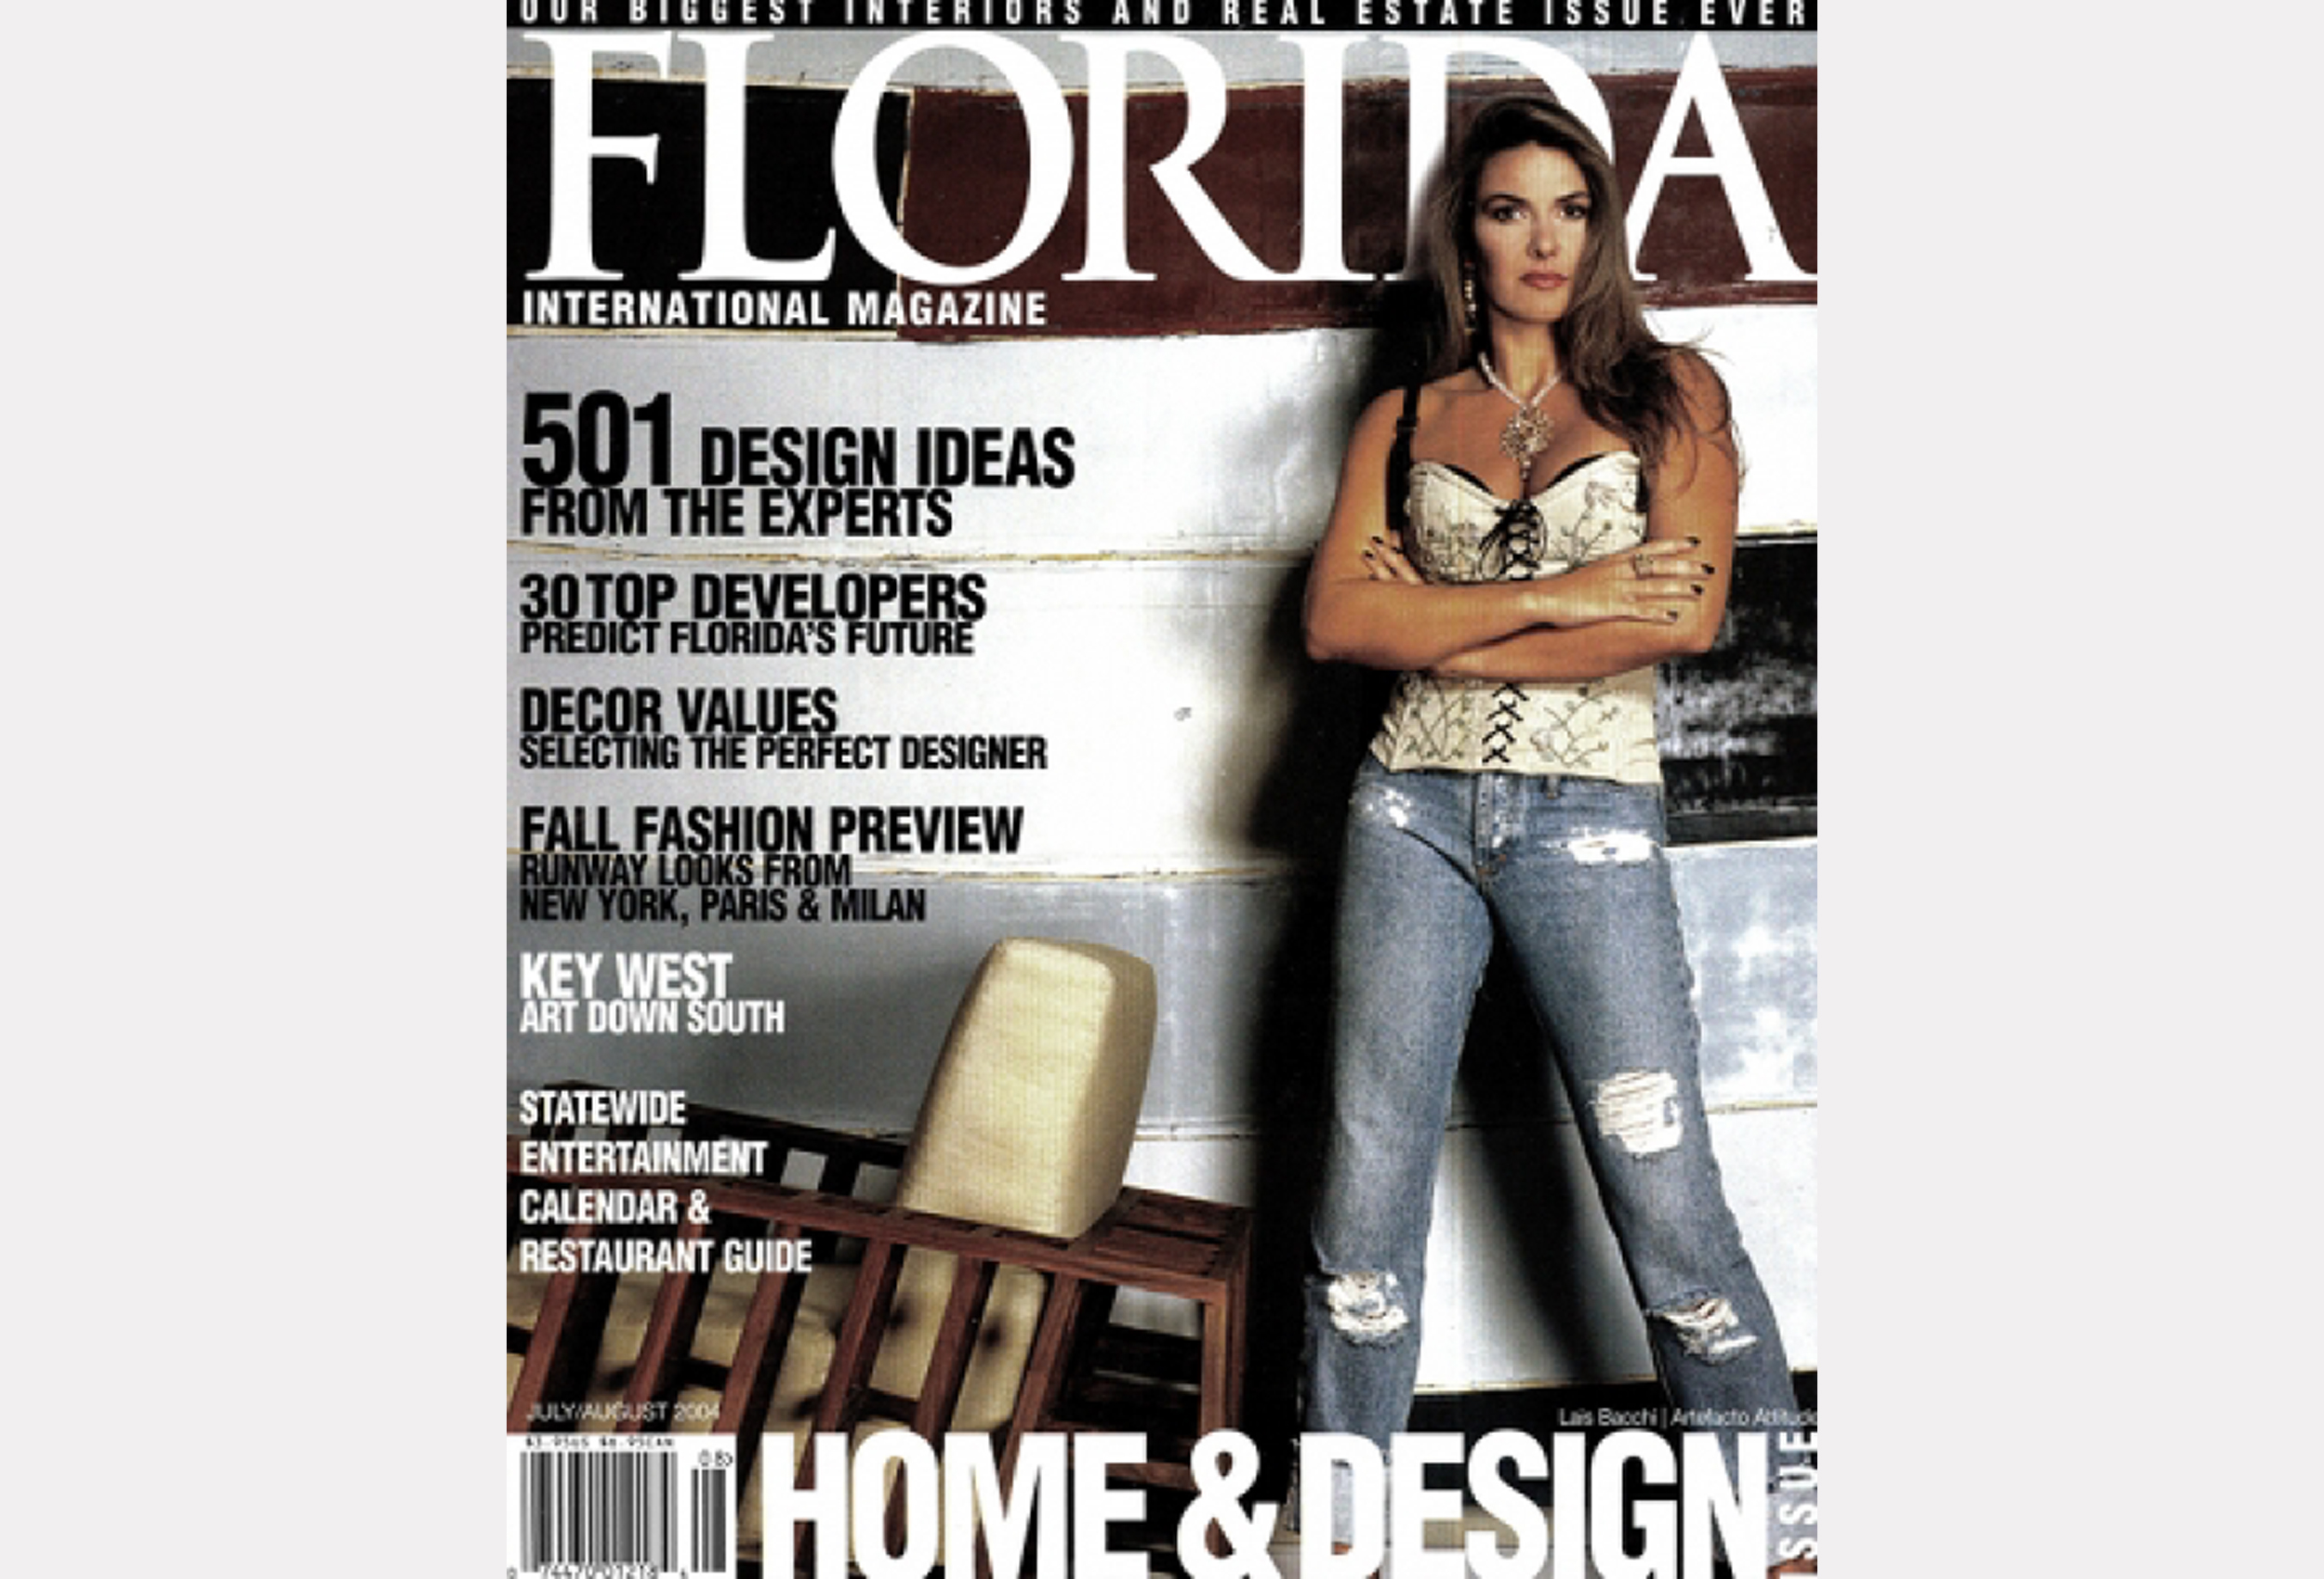 Florida International 2004